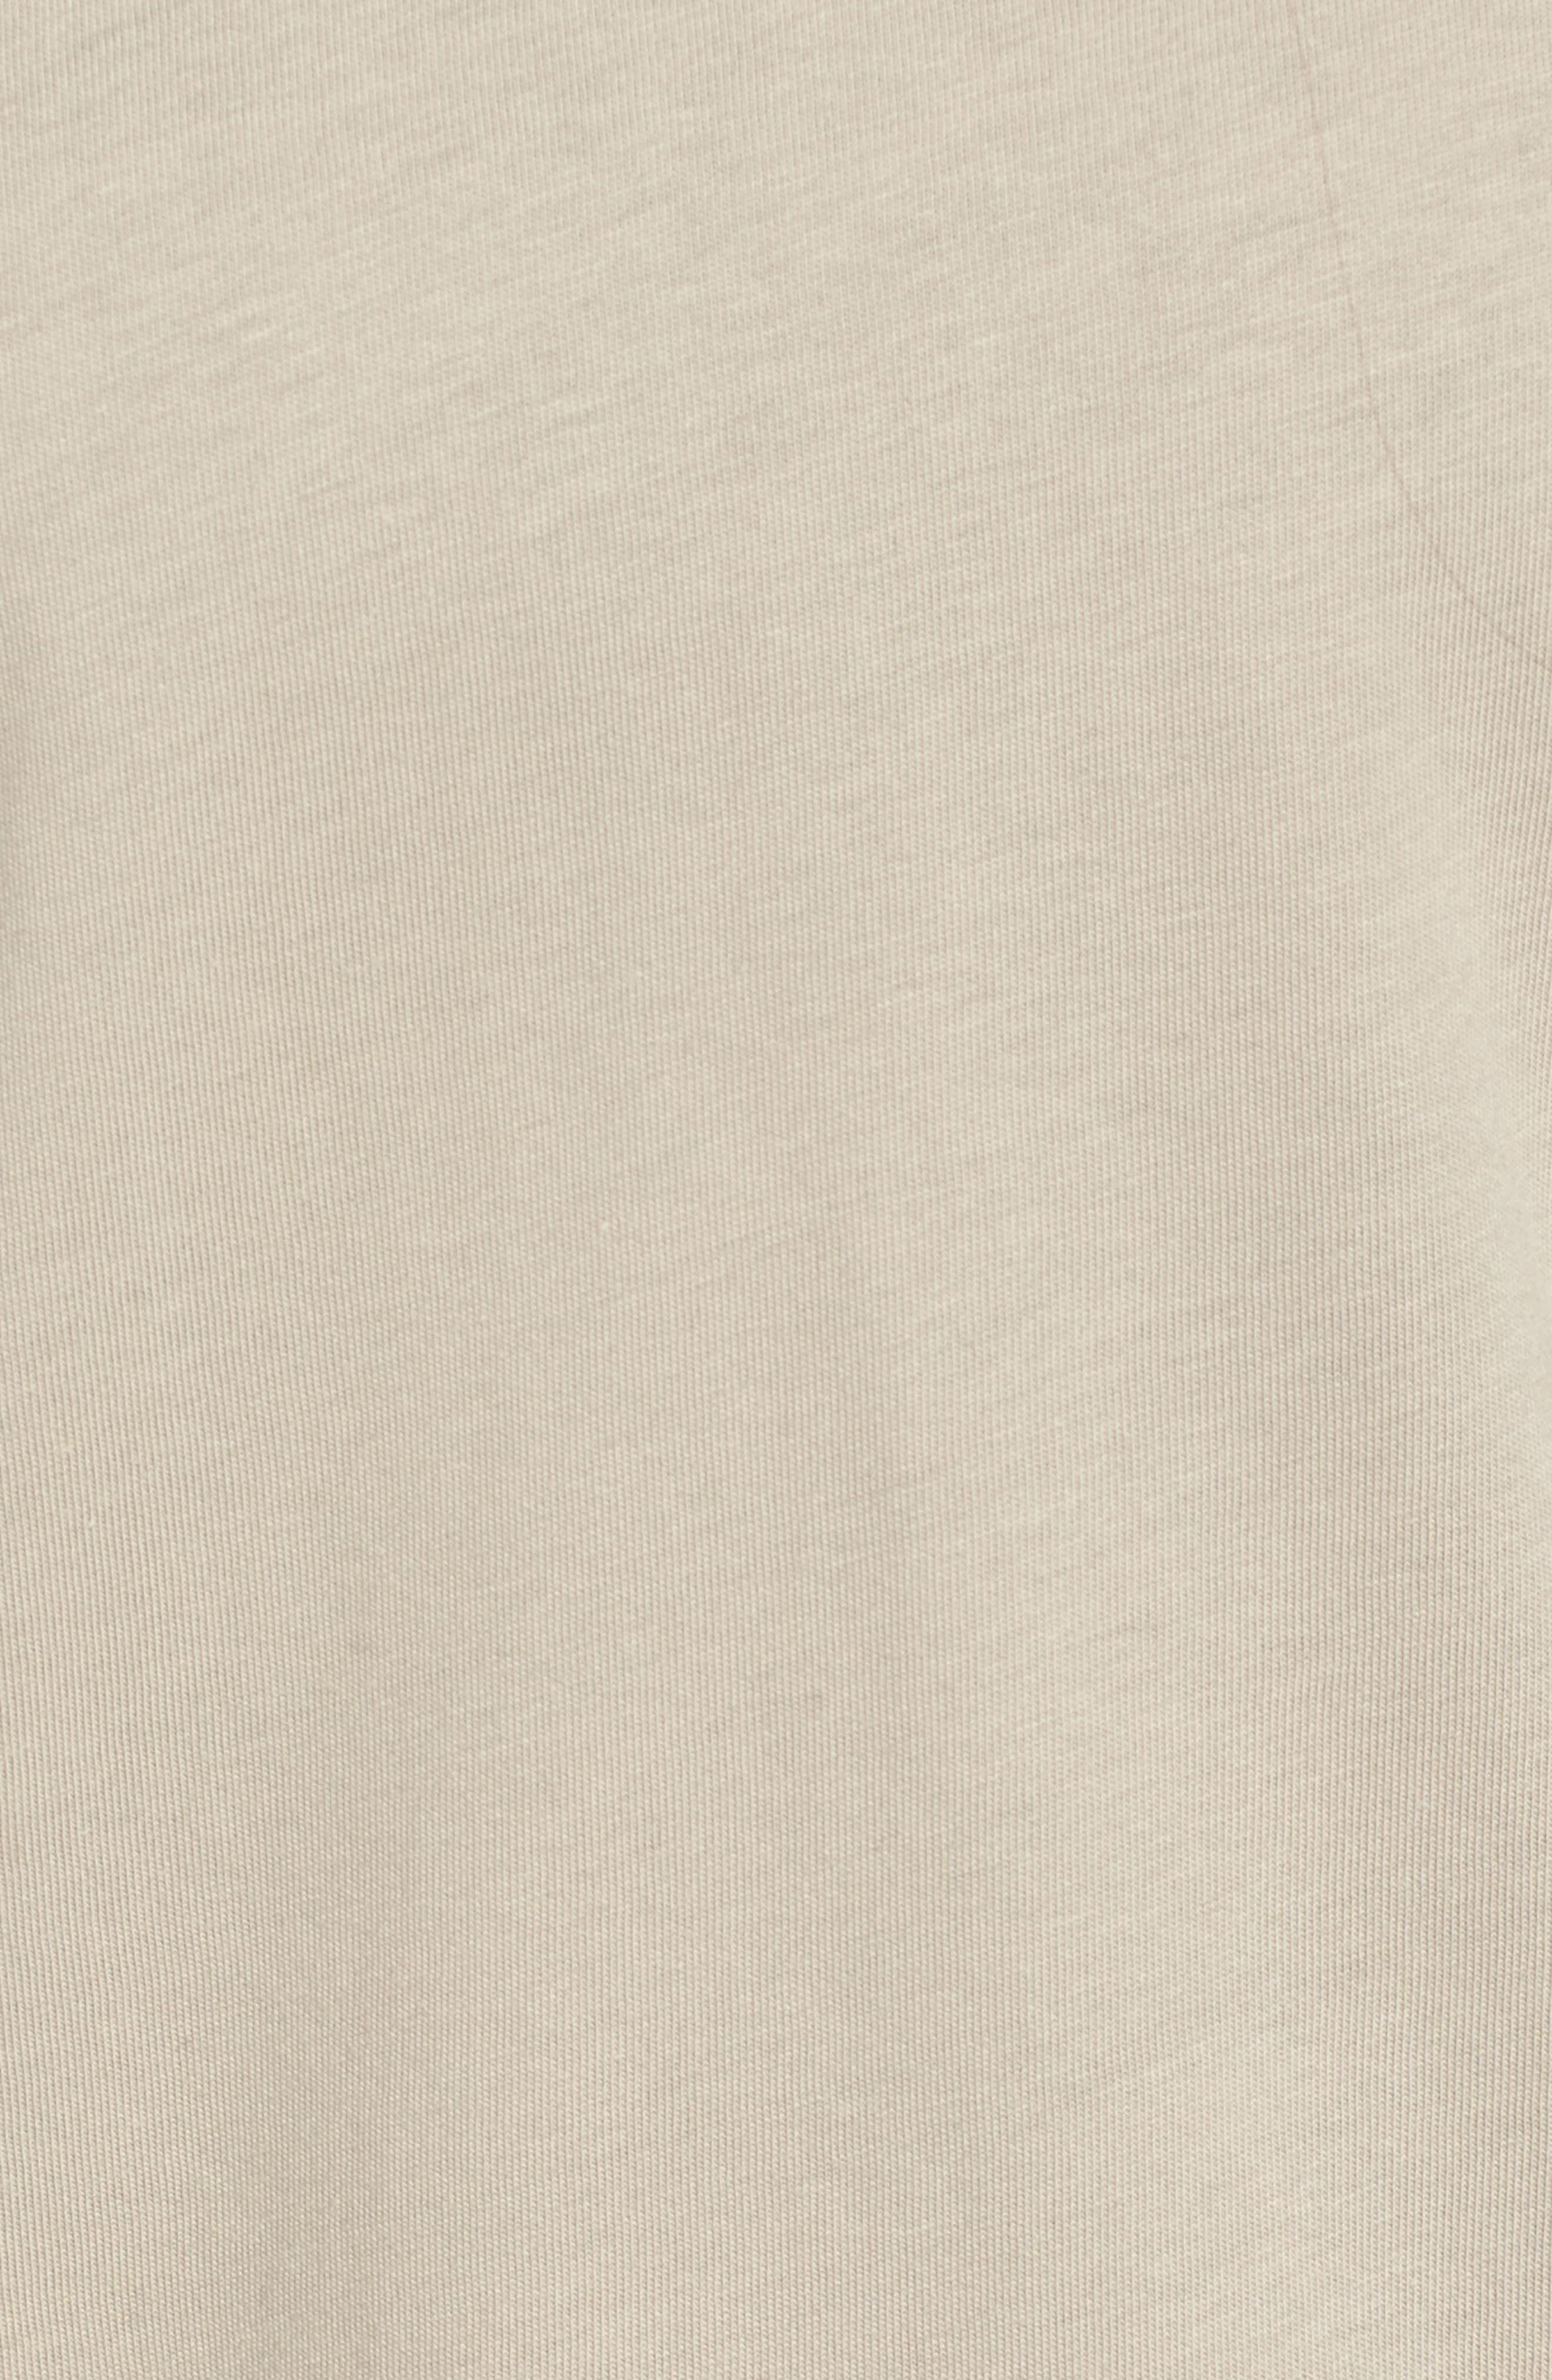 Logo Sleeve Longline Tee,                             Alternate thumbnail 6, color,                             Laurel Oak